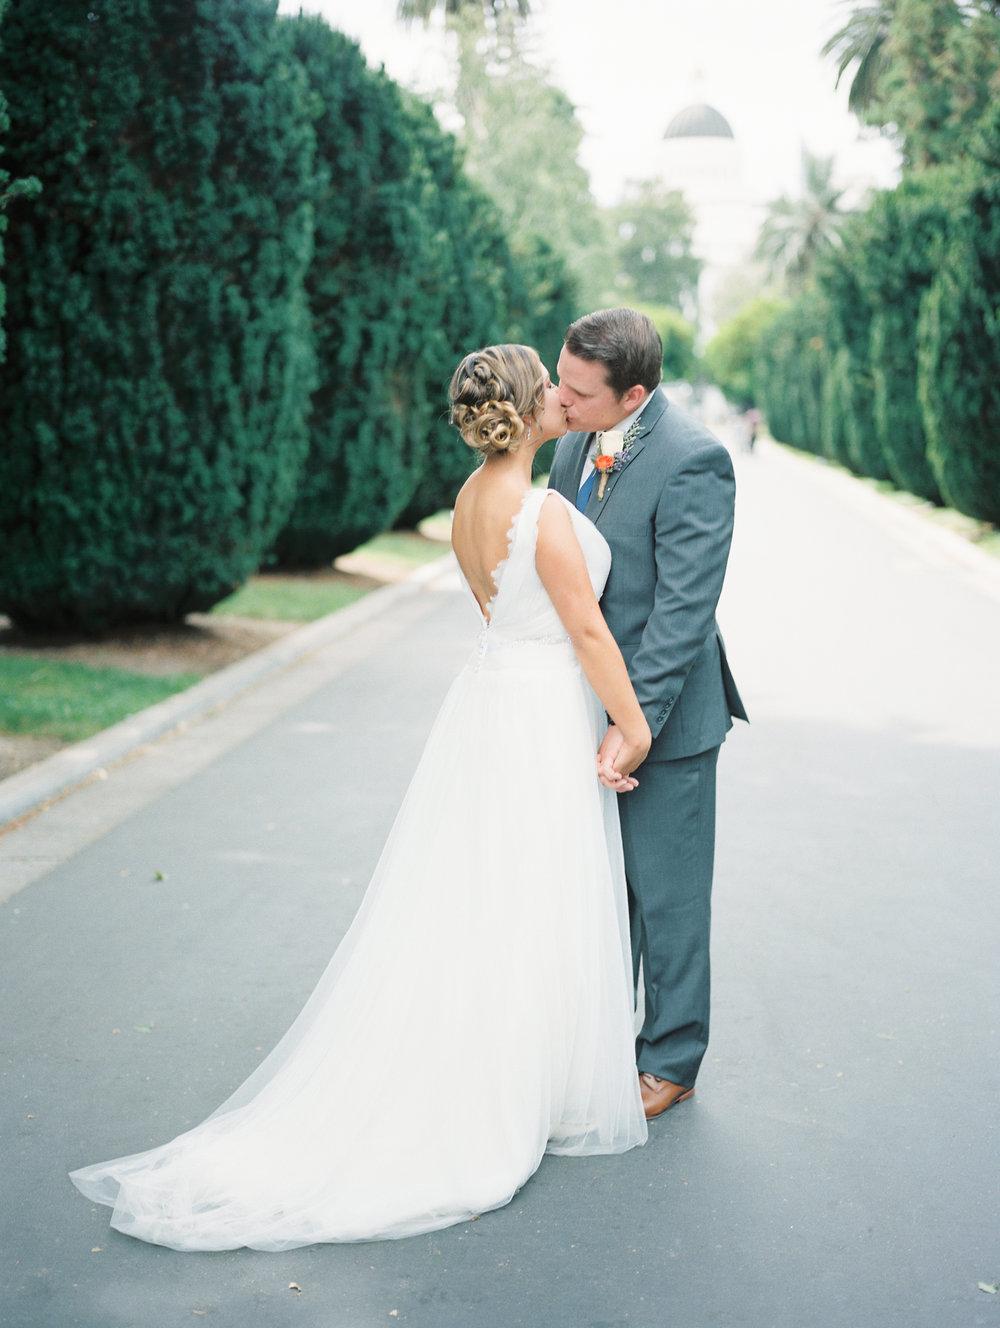 city-hall-wedding-filmscans-6.jpg